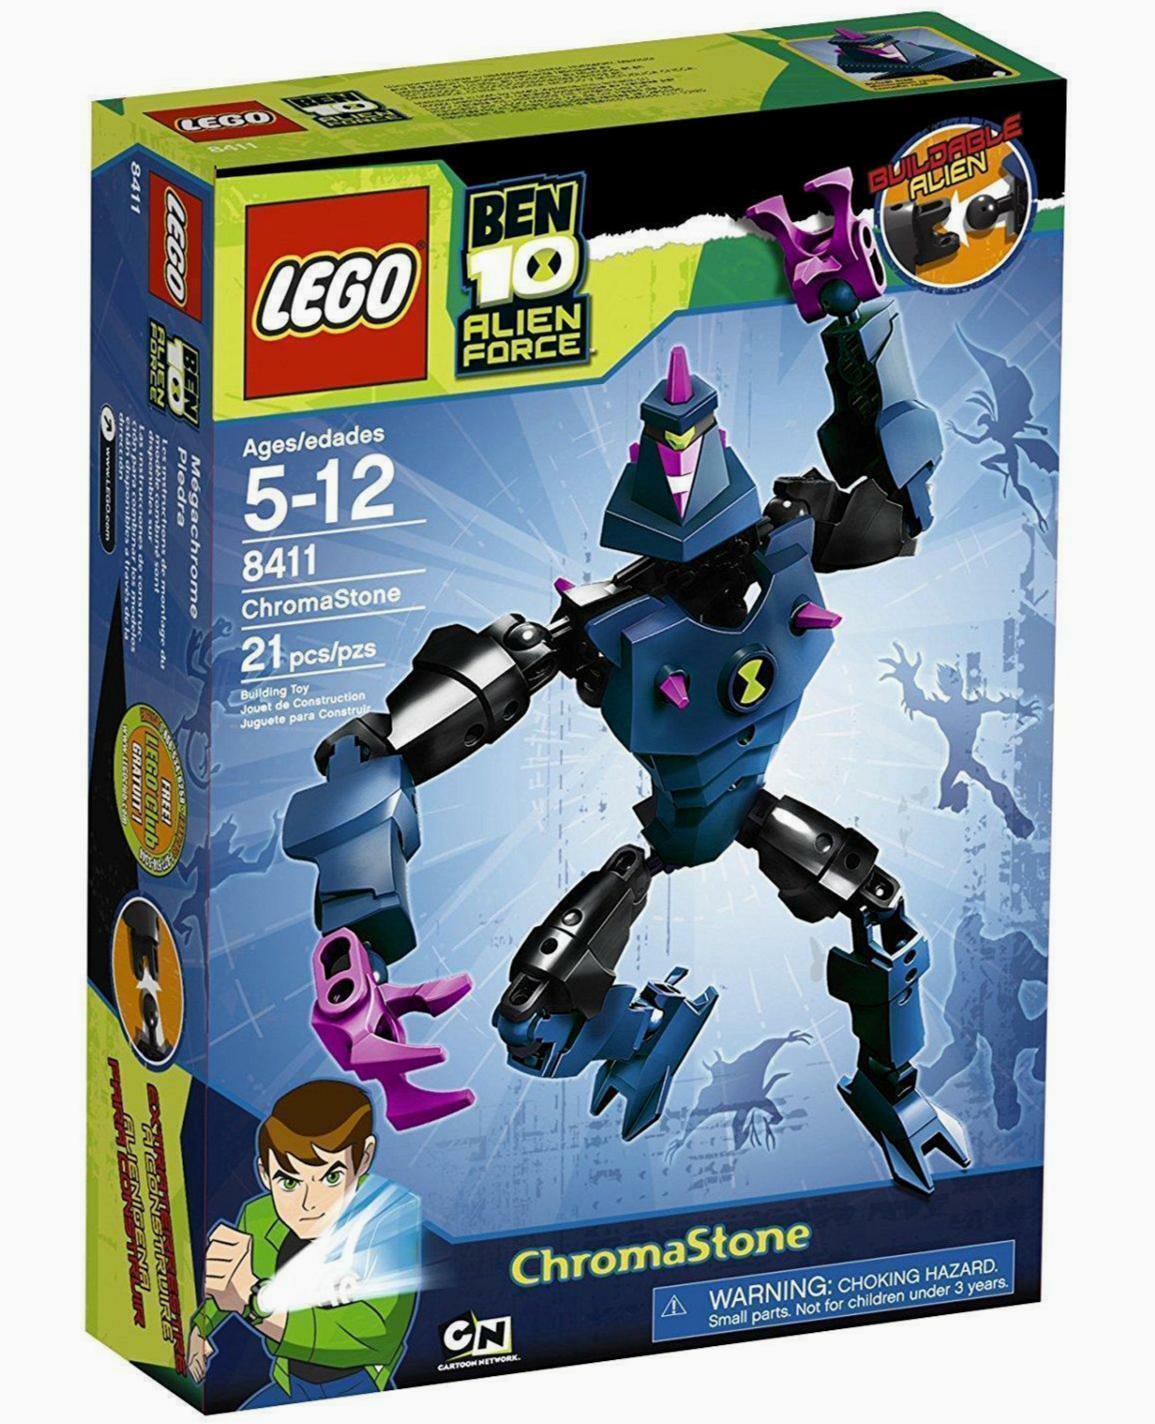 Lego Ben 10 Alien Force ChromaStone Nuovo 8411 Cartoon Network 21 pieces